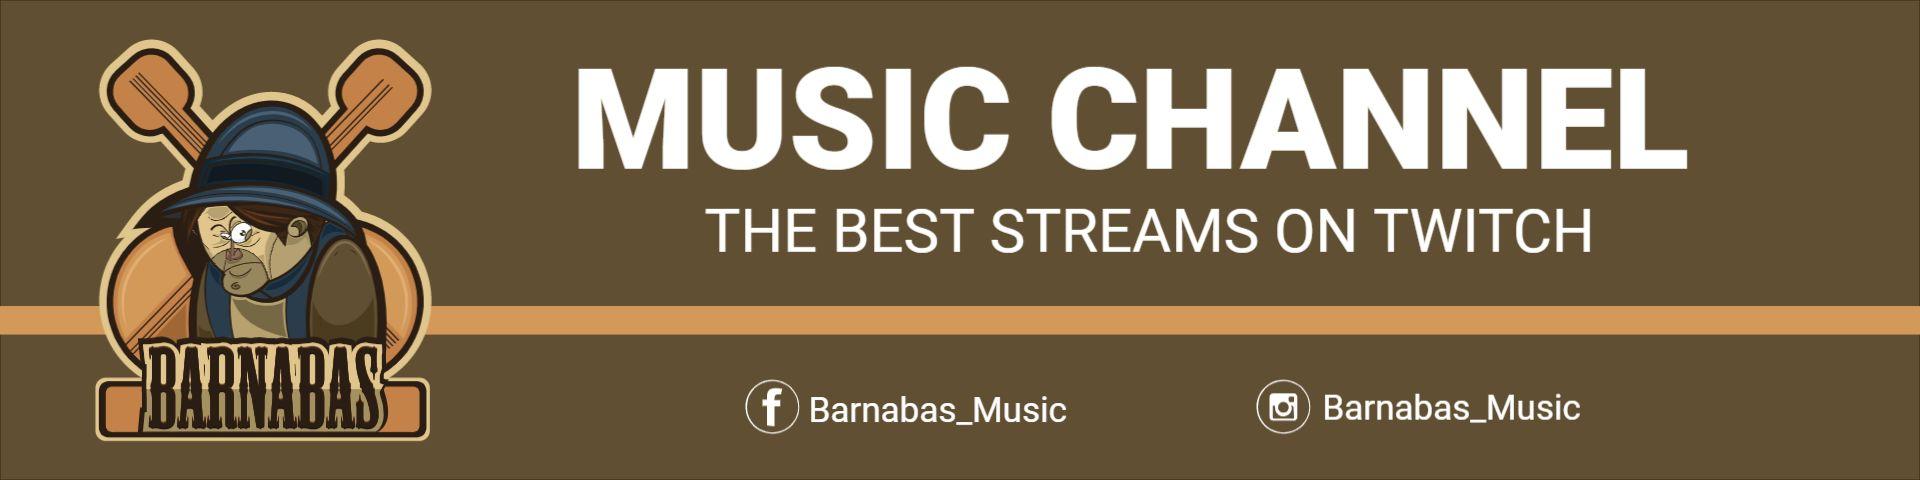 Music Channel Twitch Banner